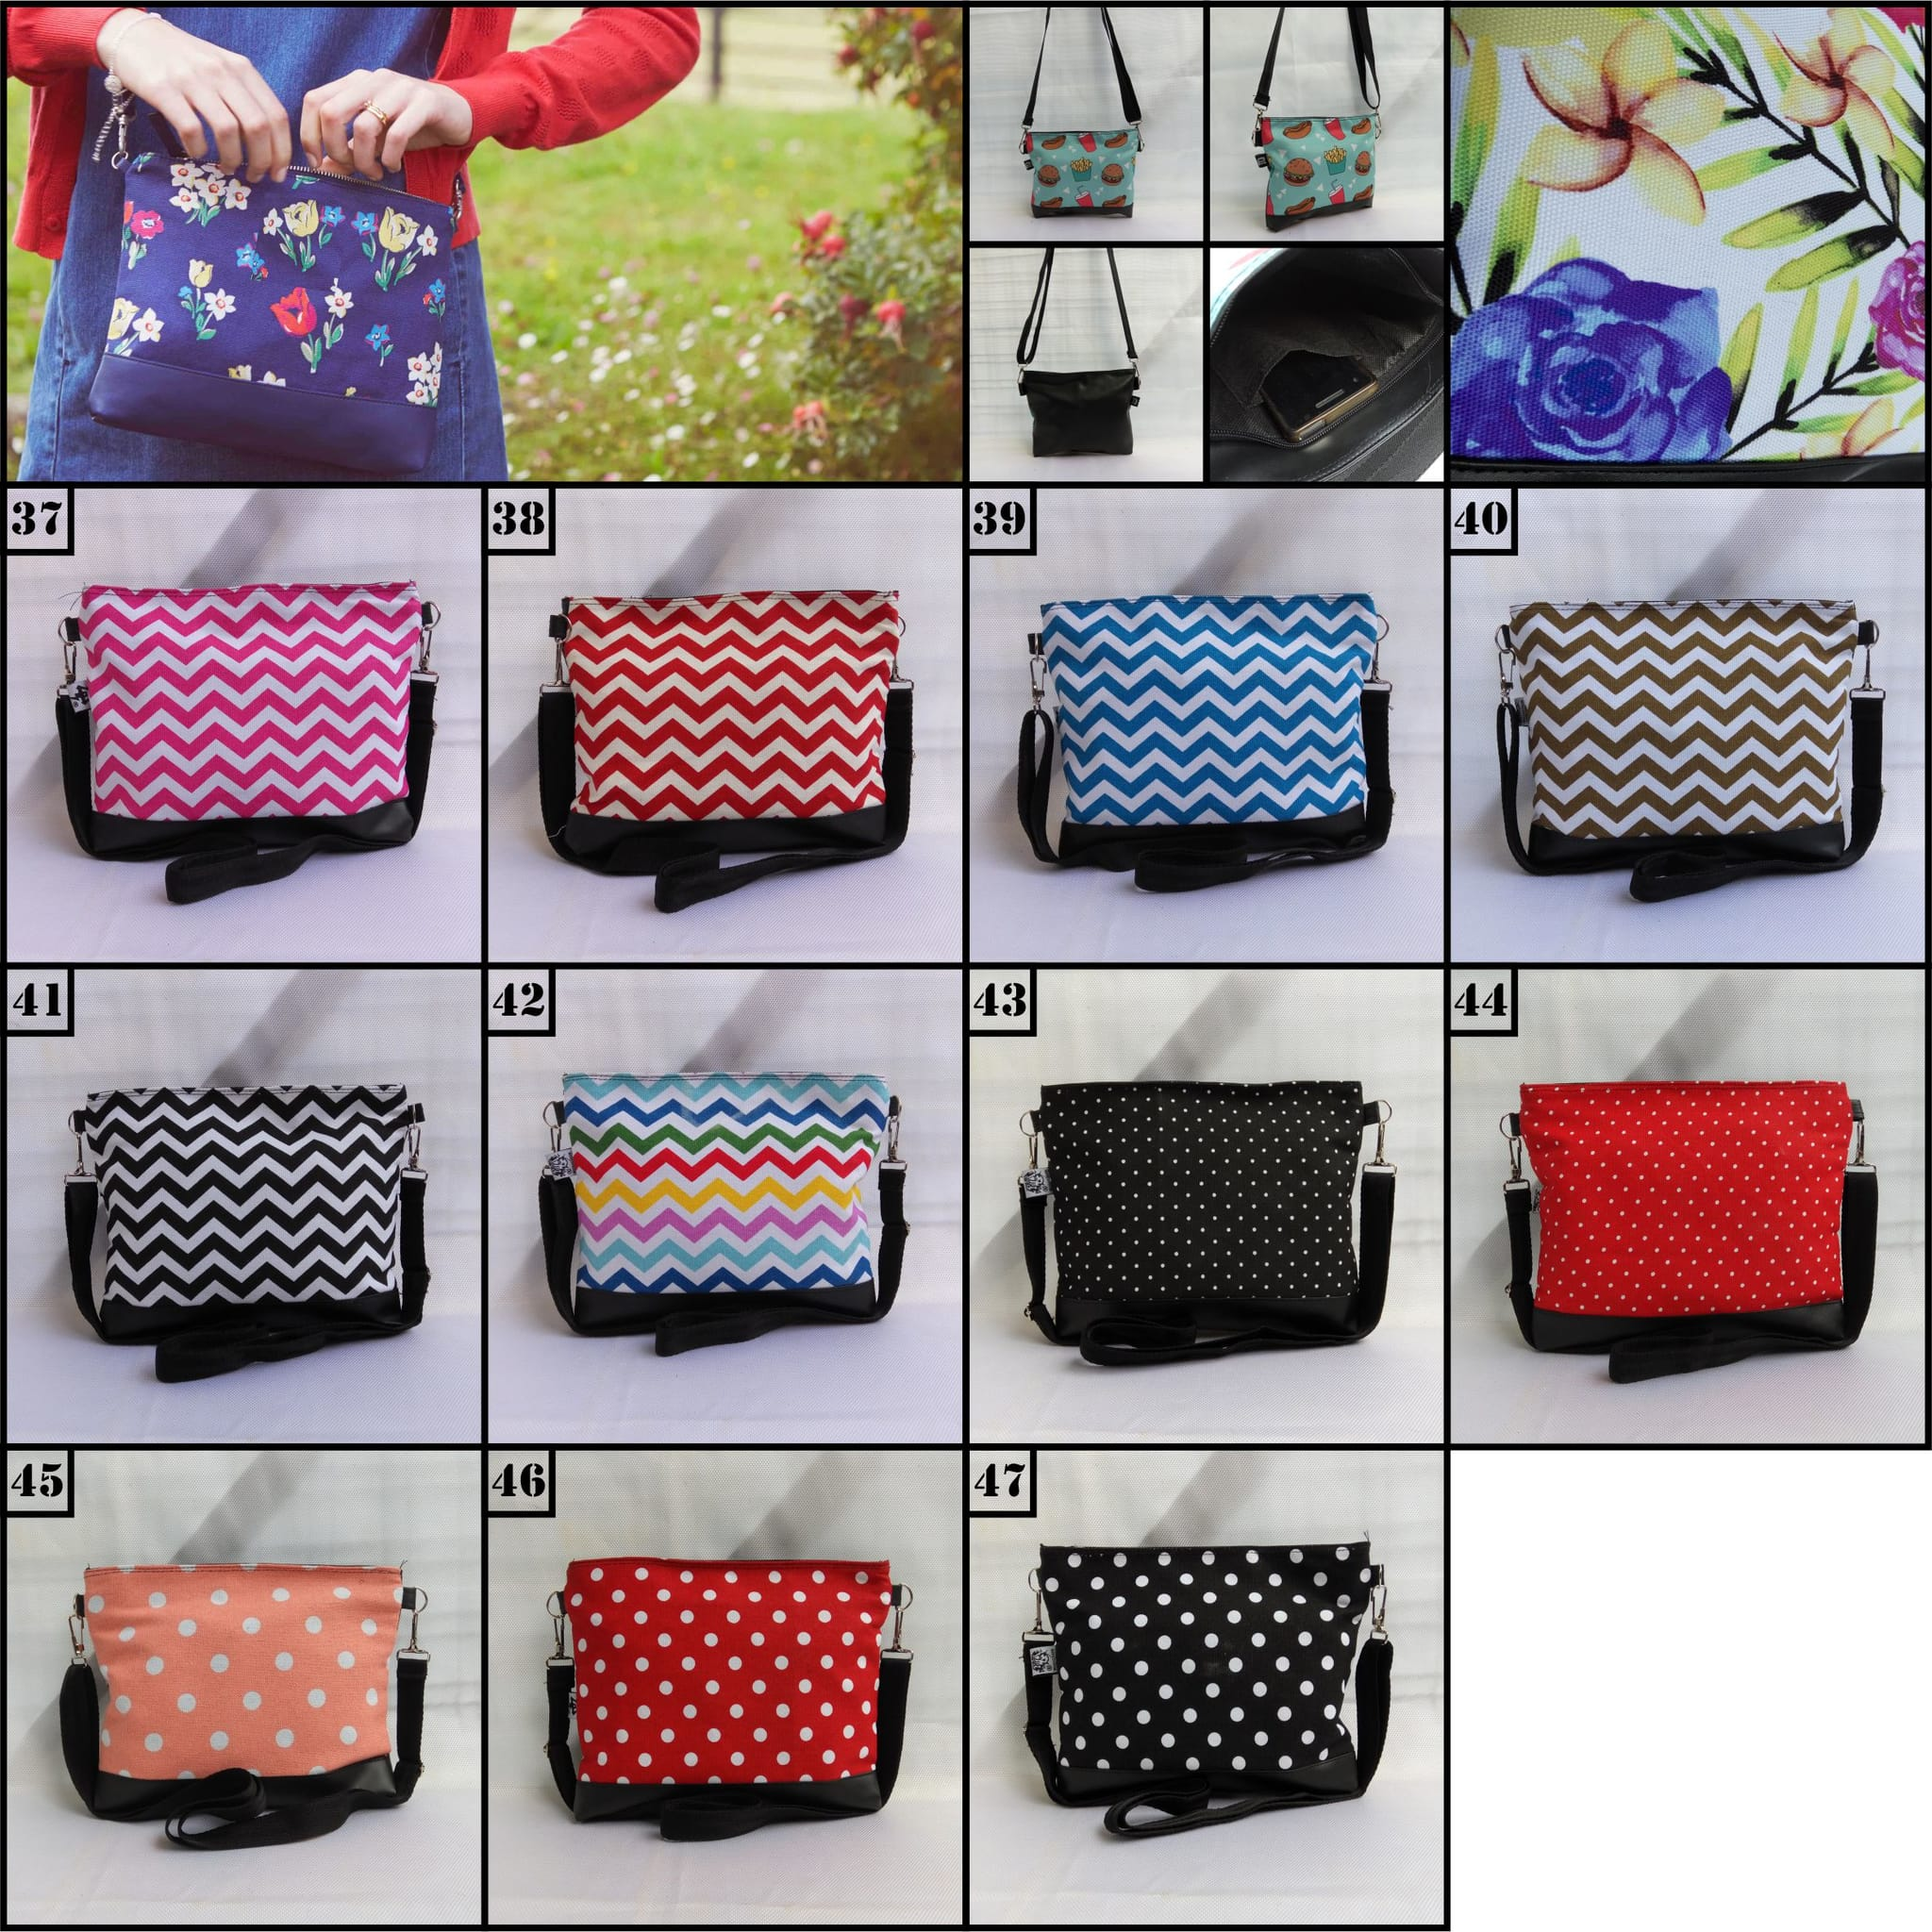 Sling bag tokopedia -  Sling Bag Mini Tas Selempang Mini Model Cath Kidston Murah